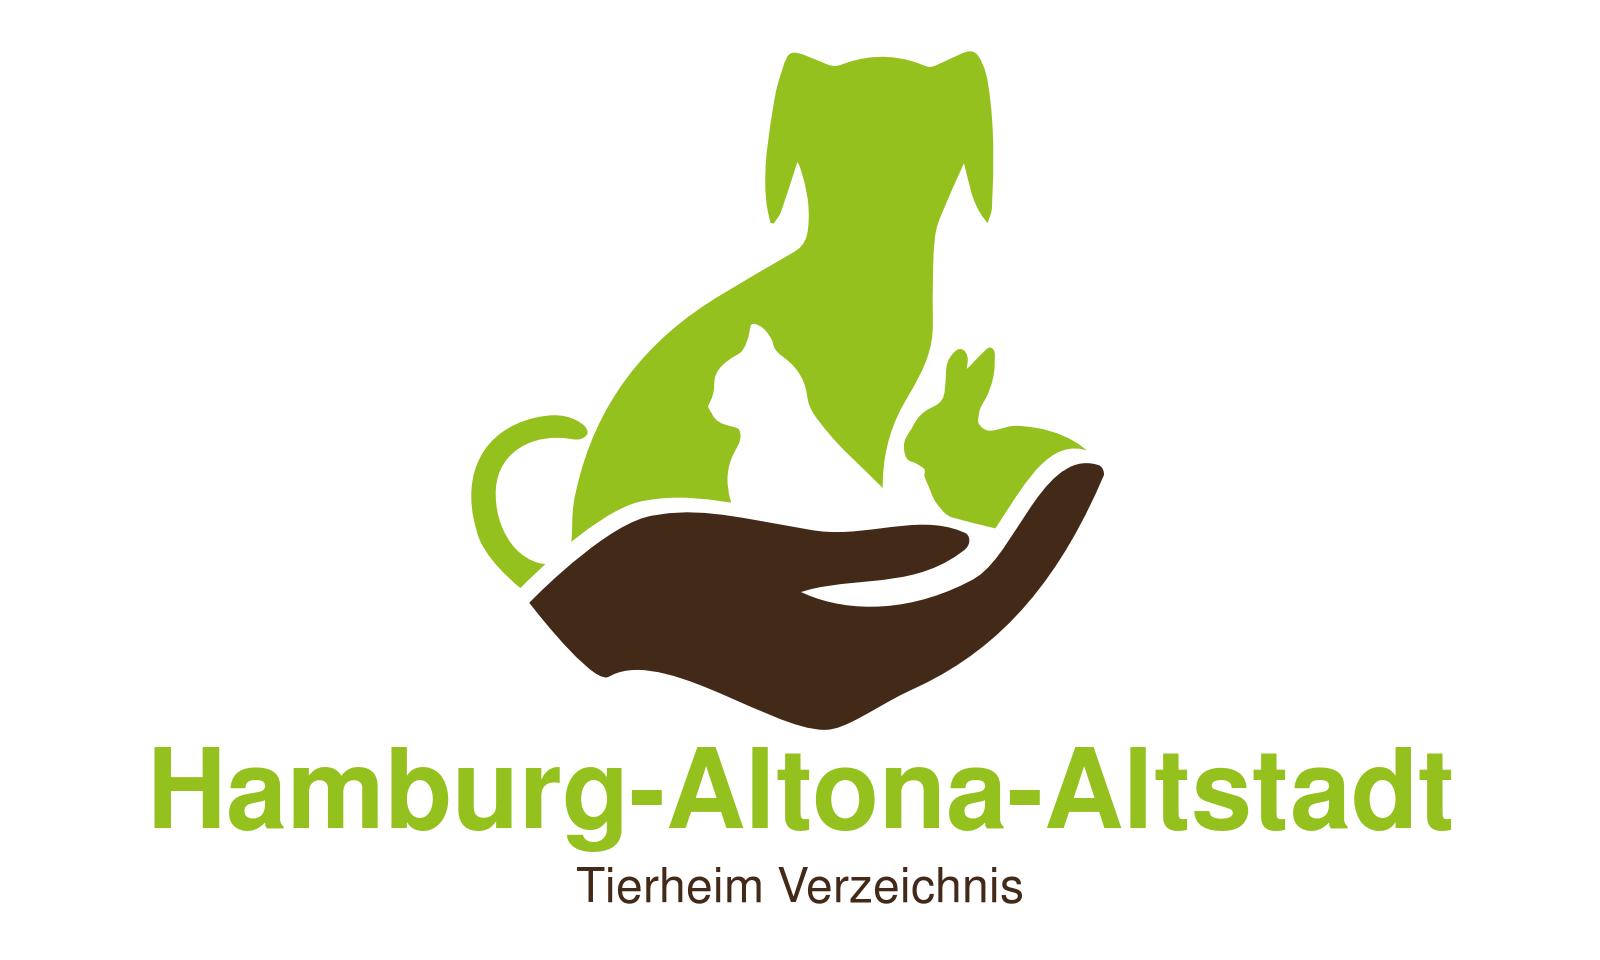 Tierheim Hamburg Altona-Altstadt